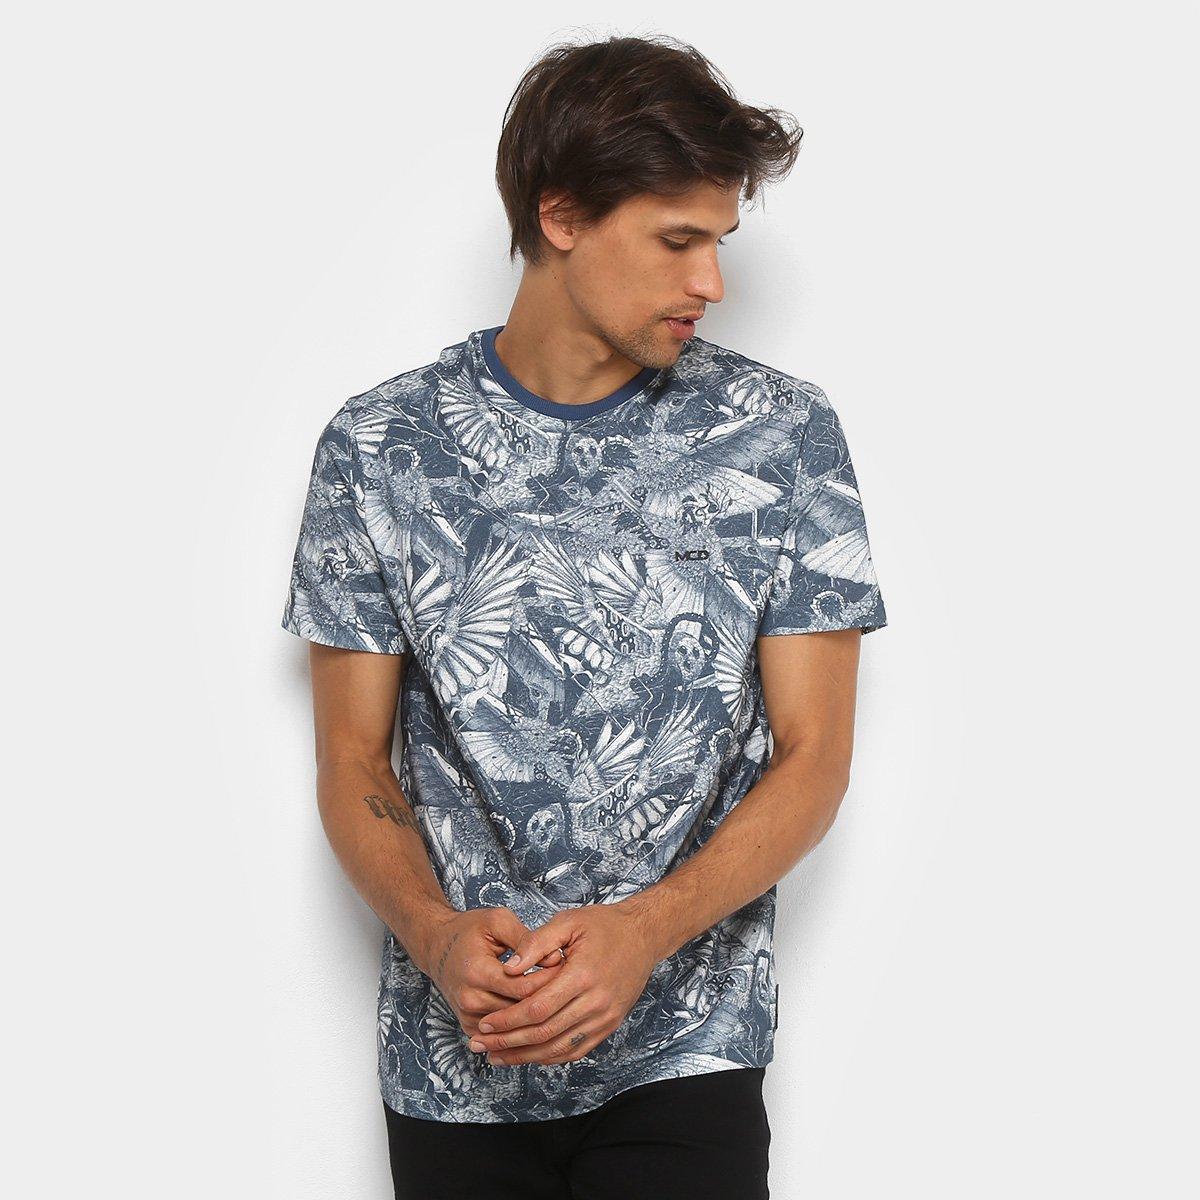 58ac17bd60 Camiseta MCD Especial Full Bird Bloom Masculina - Preto